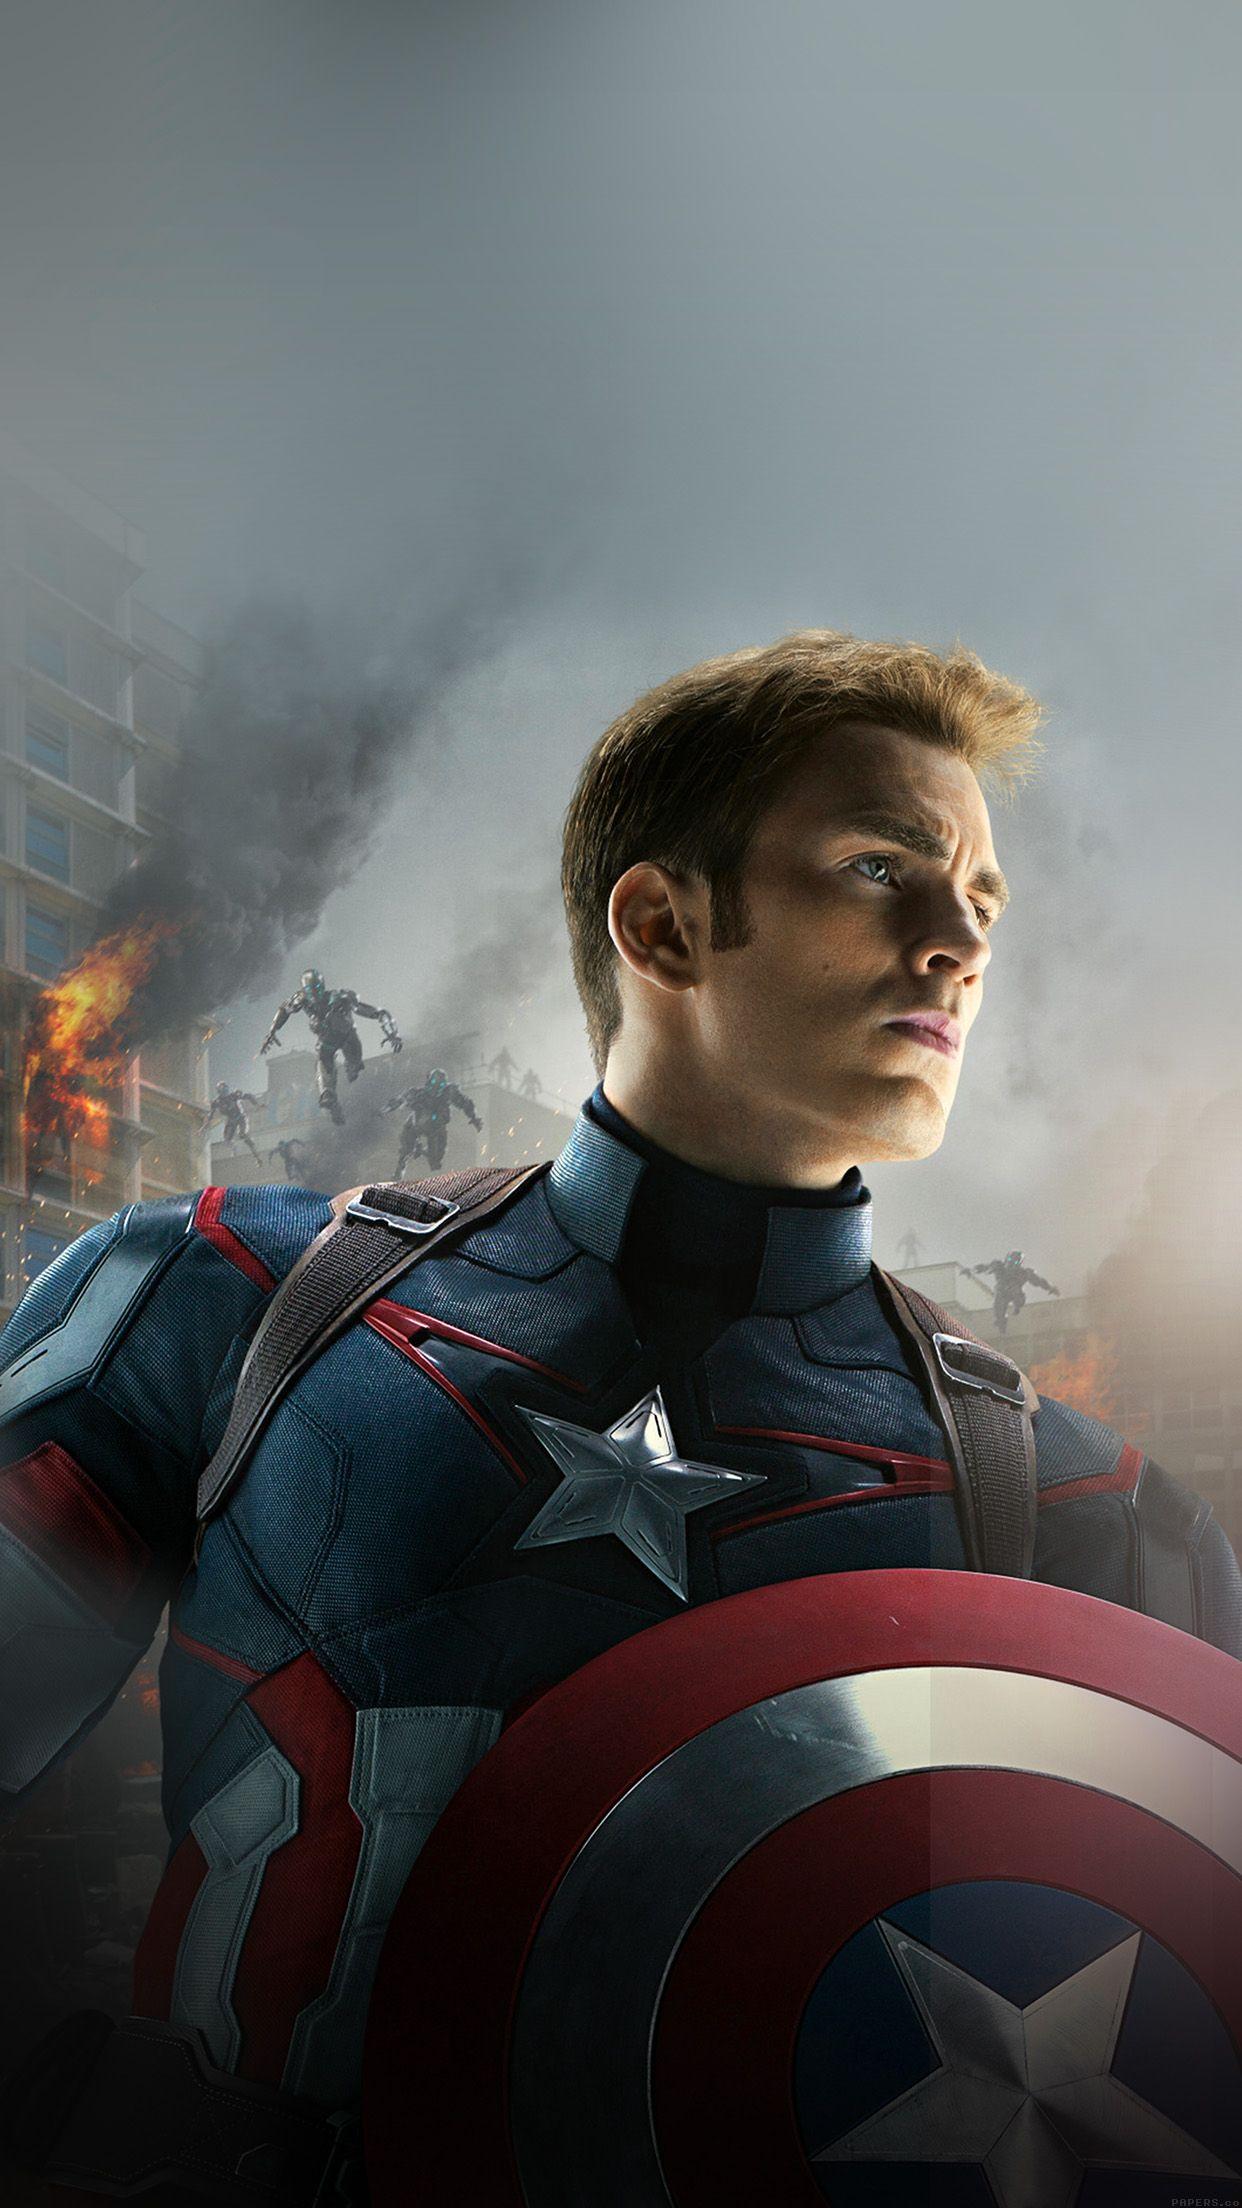 Pin By Reagan Elizabeth On Chris Evans Captain America Avengers